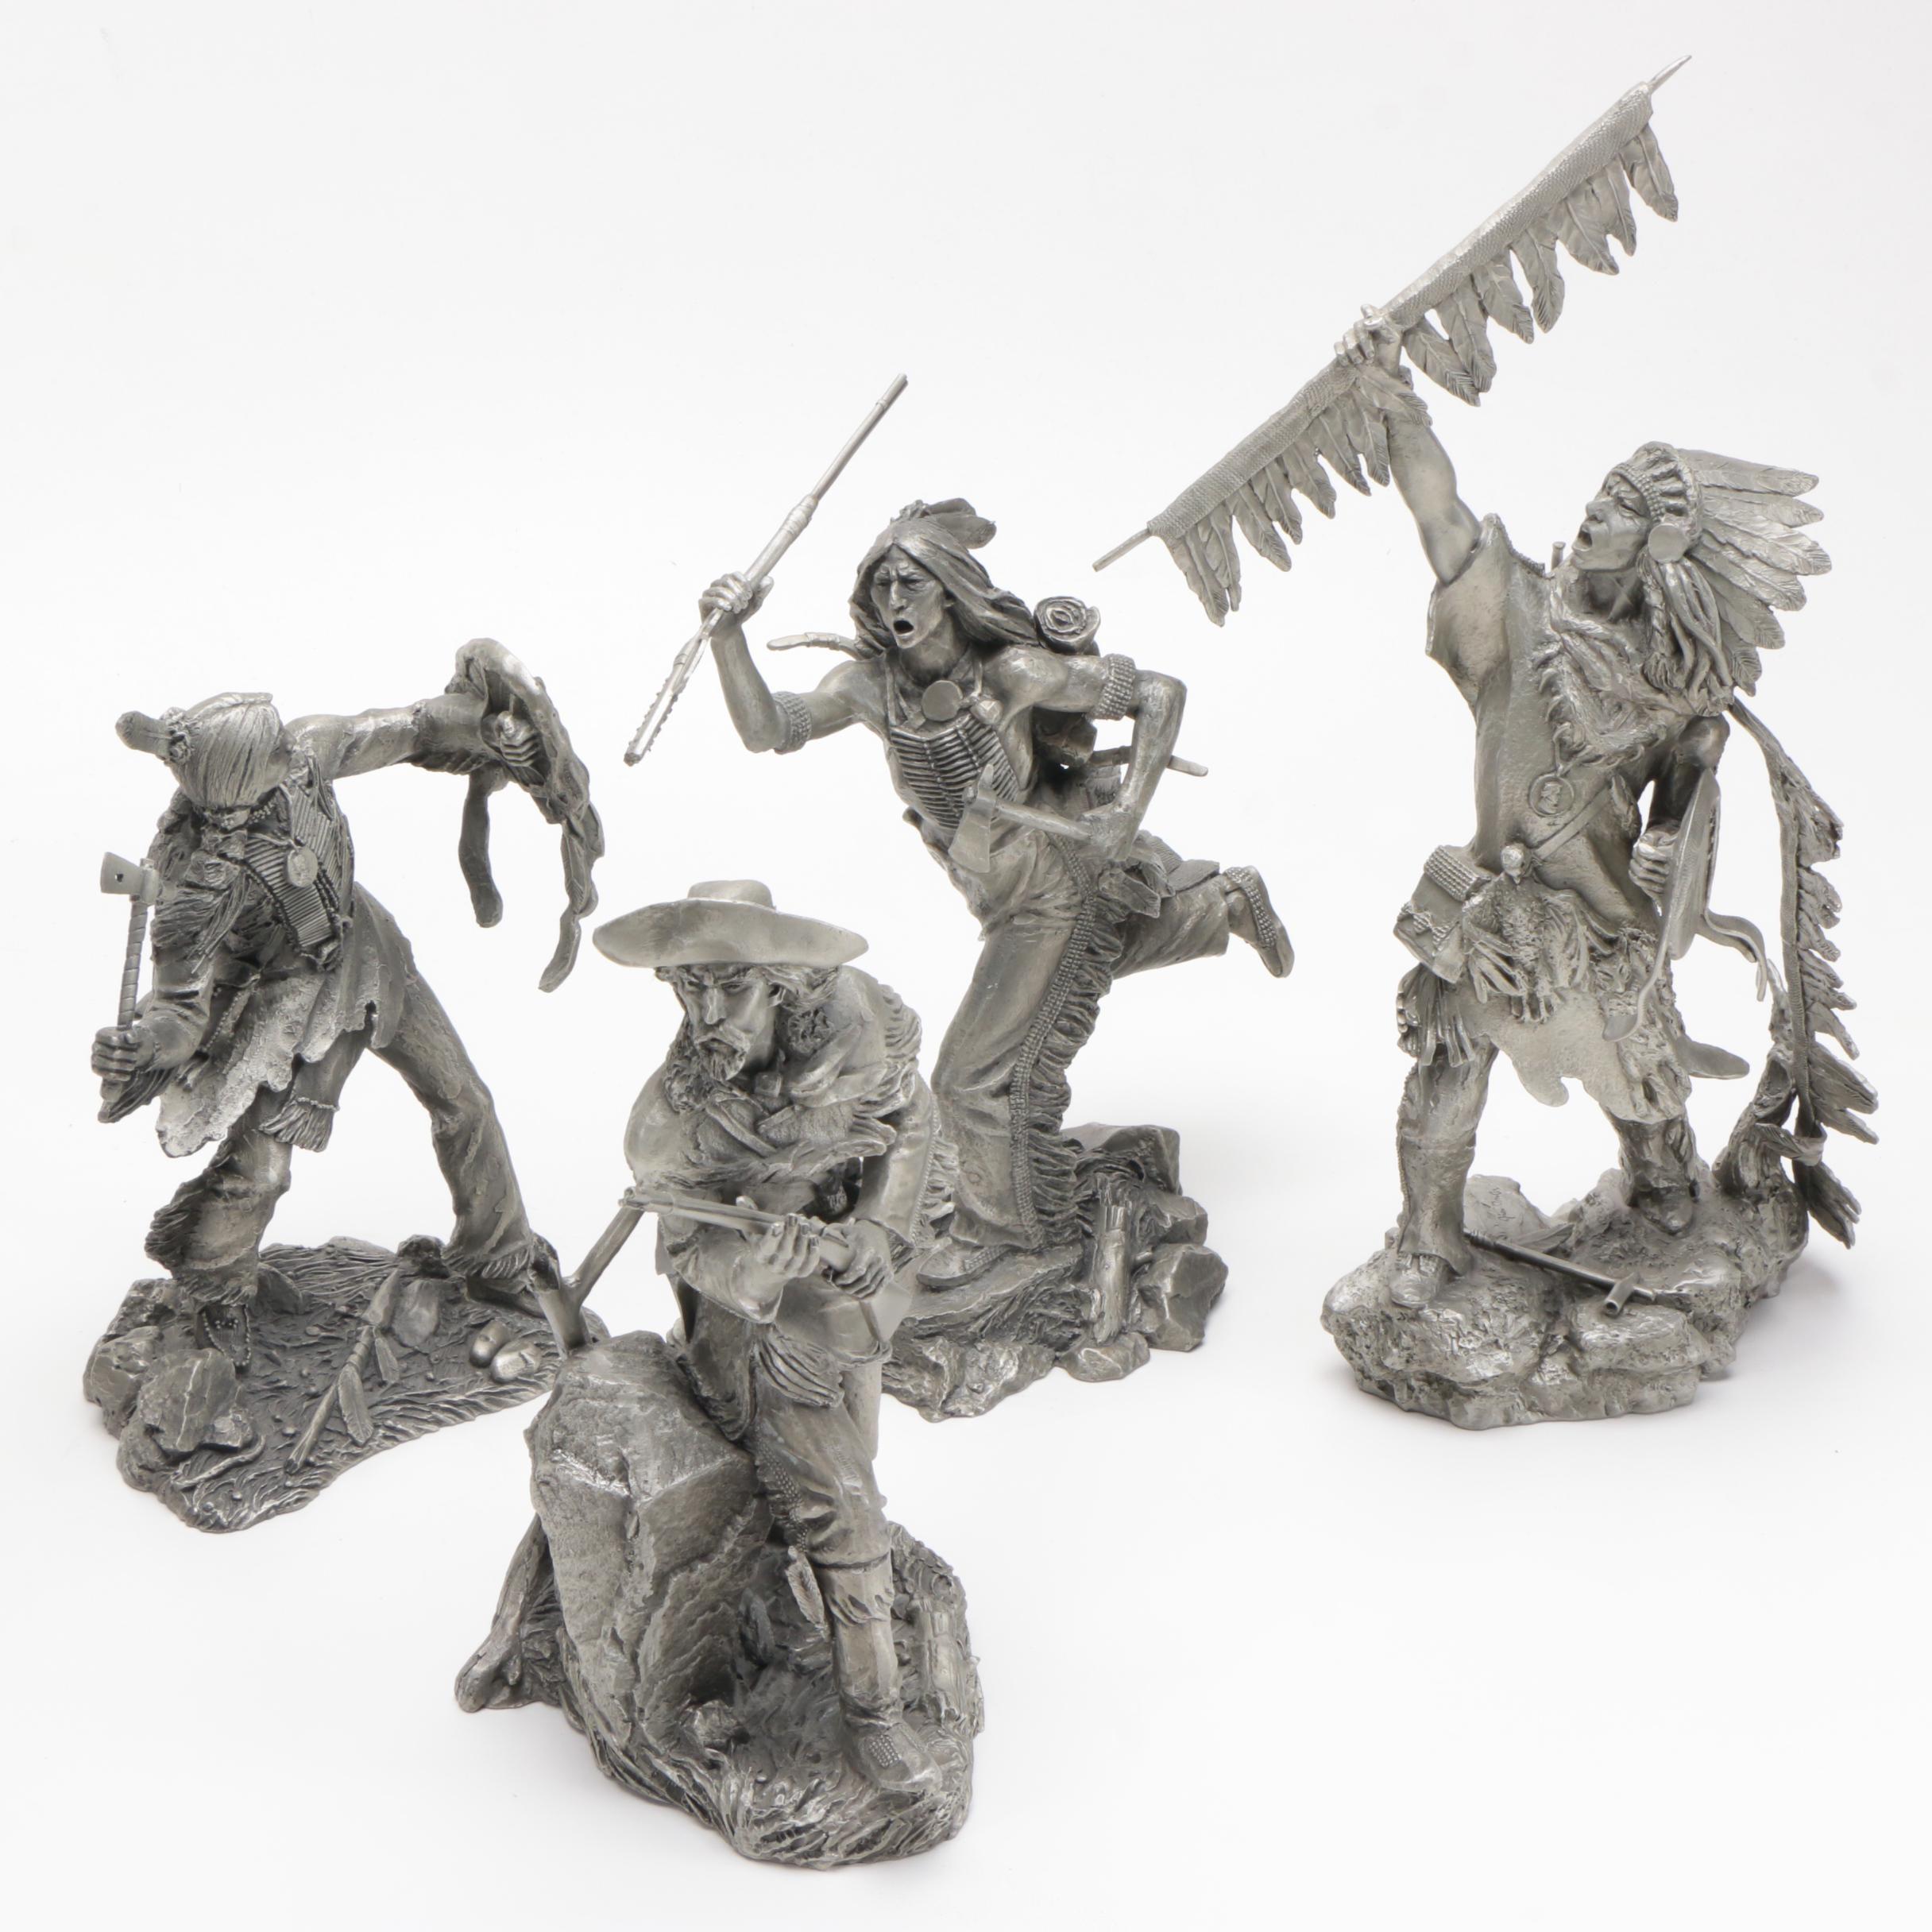 Cast Pewter Limited Edition Sculptures After Jim Ponter